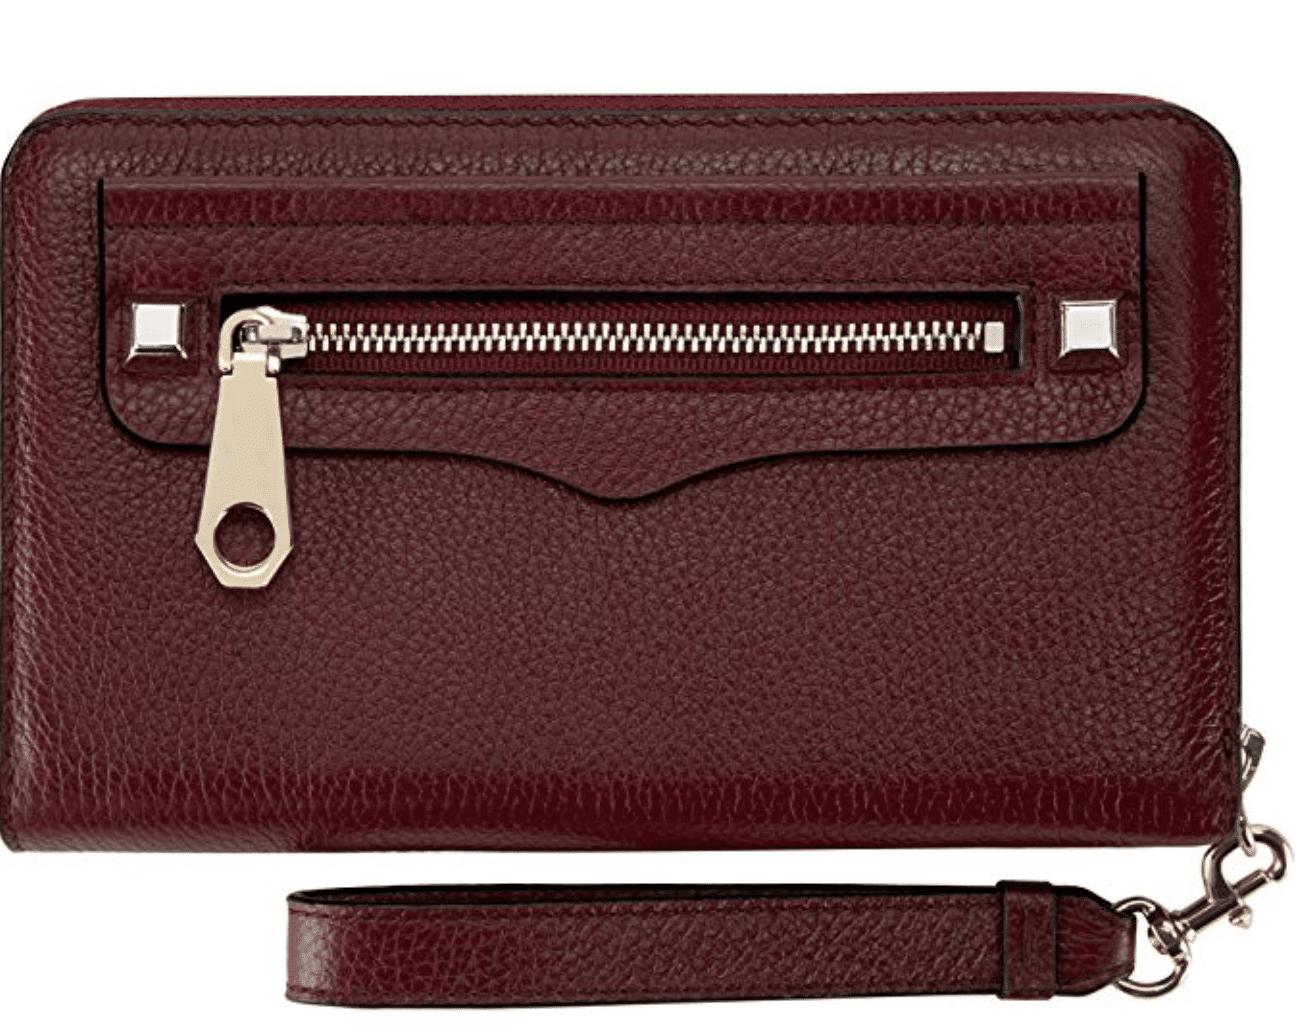 rebecca-minkoff-wallet